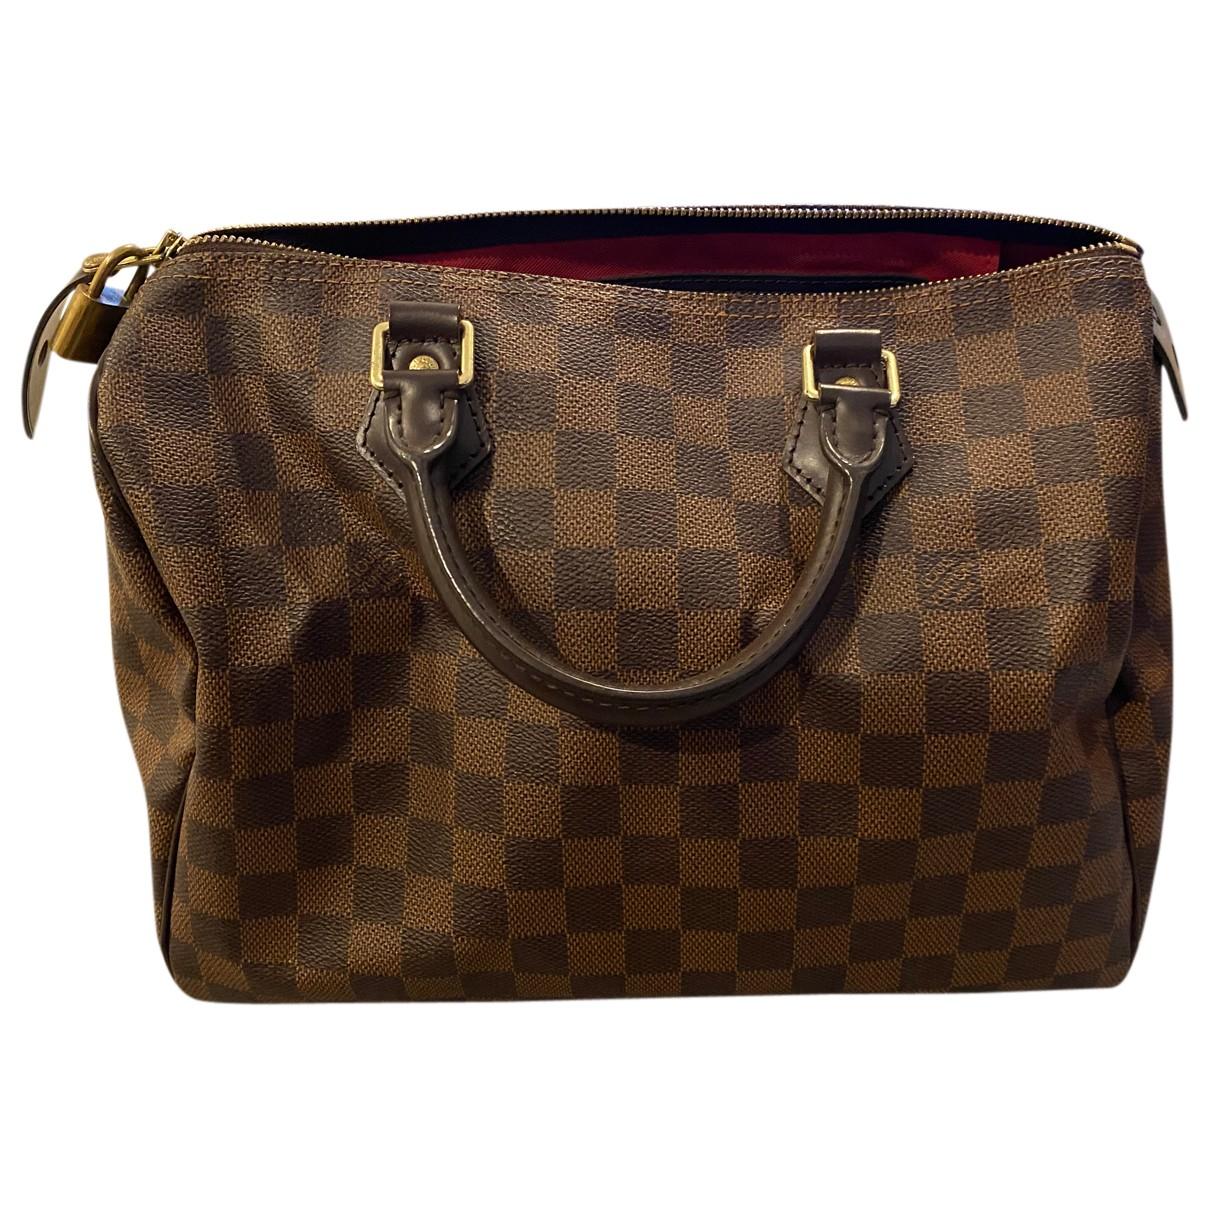 Louis Vuitton - Sac a main Speedy pour femme en cuir - marron